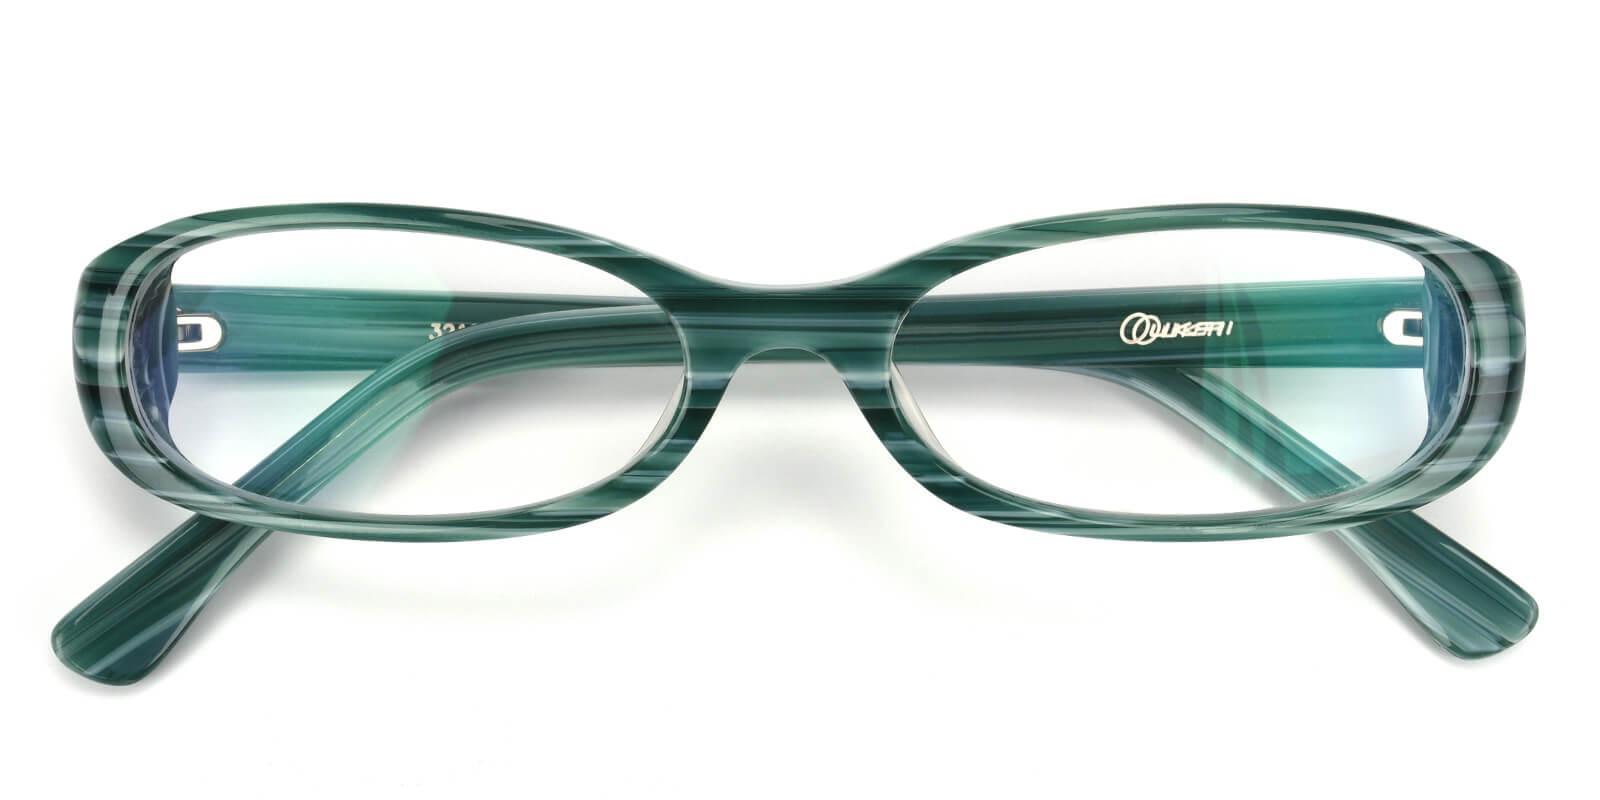 Opla-Green-Rectangle-Acetate-Eyeglasses-detail